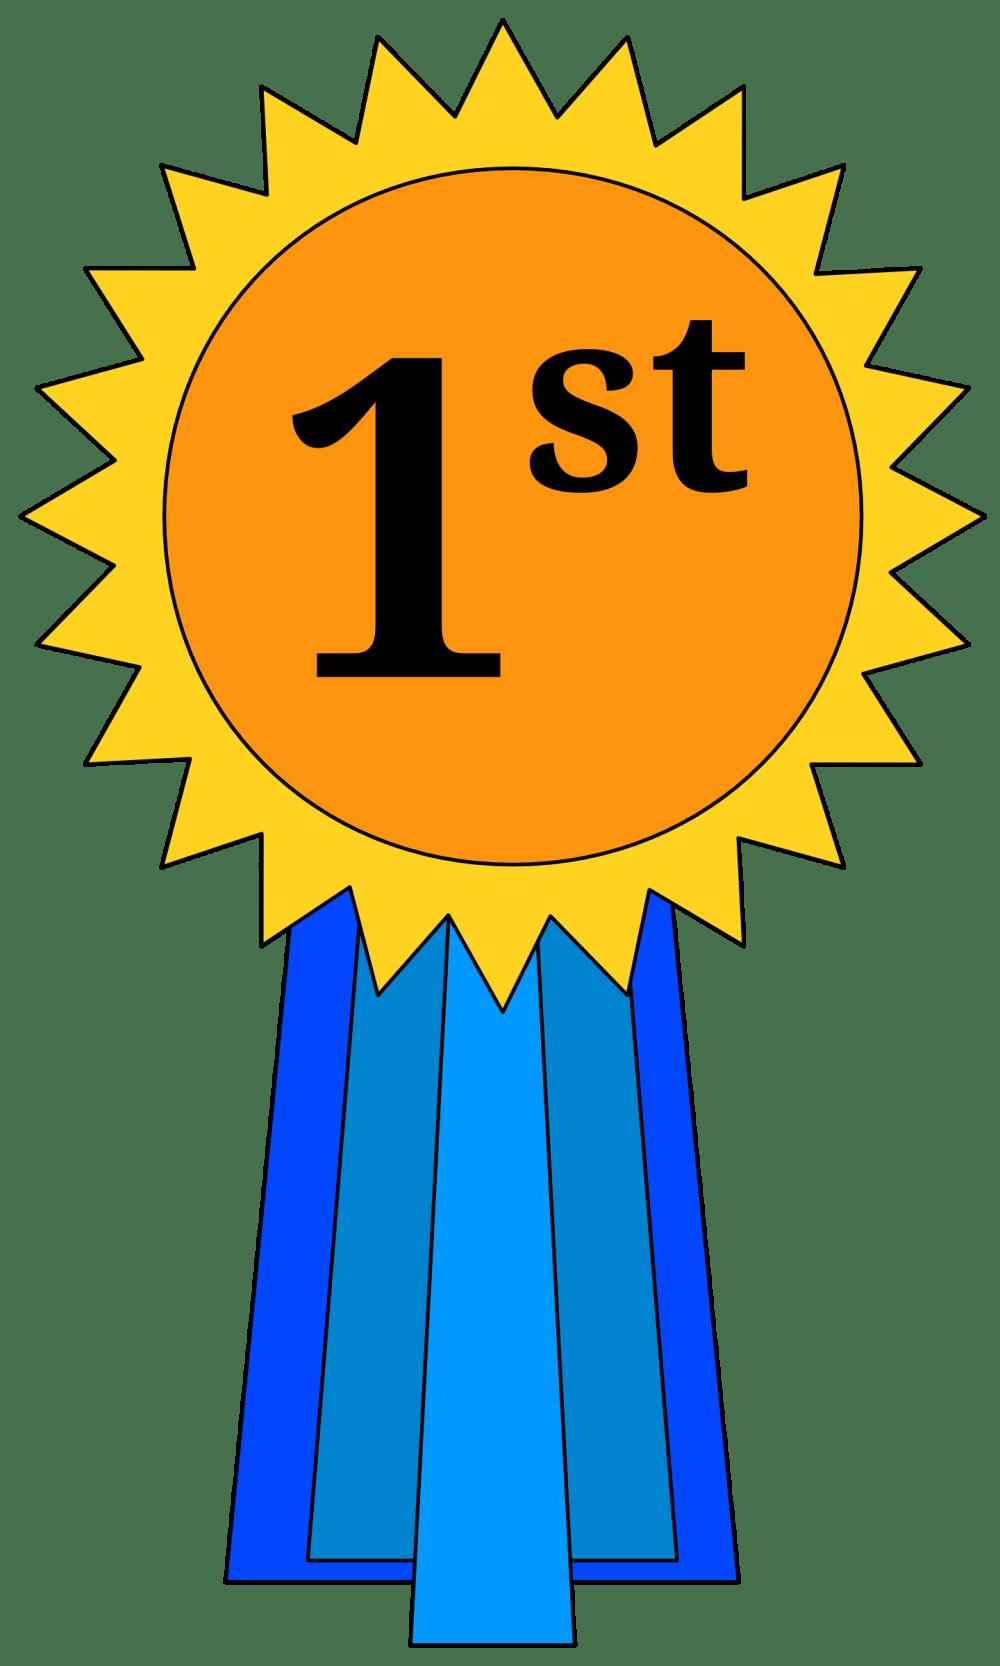 medium resolution of 1st place award ribbon clipart placepng